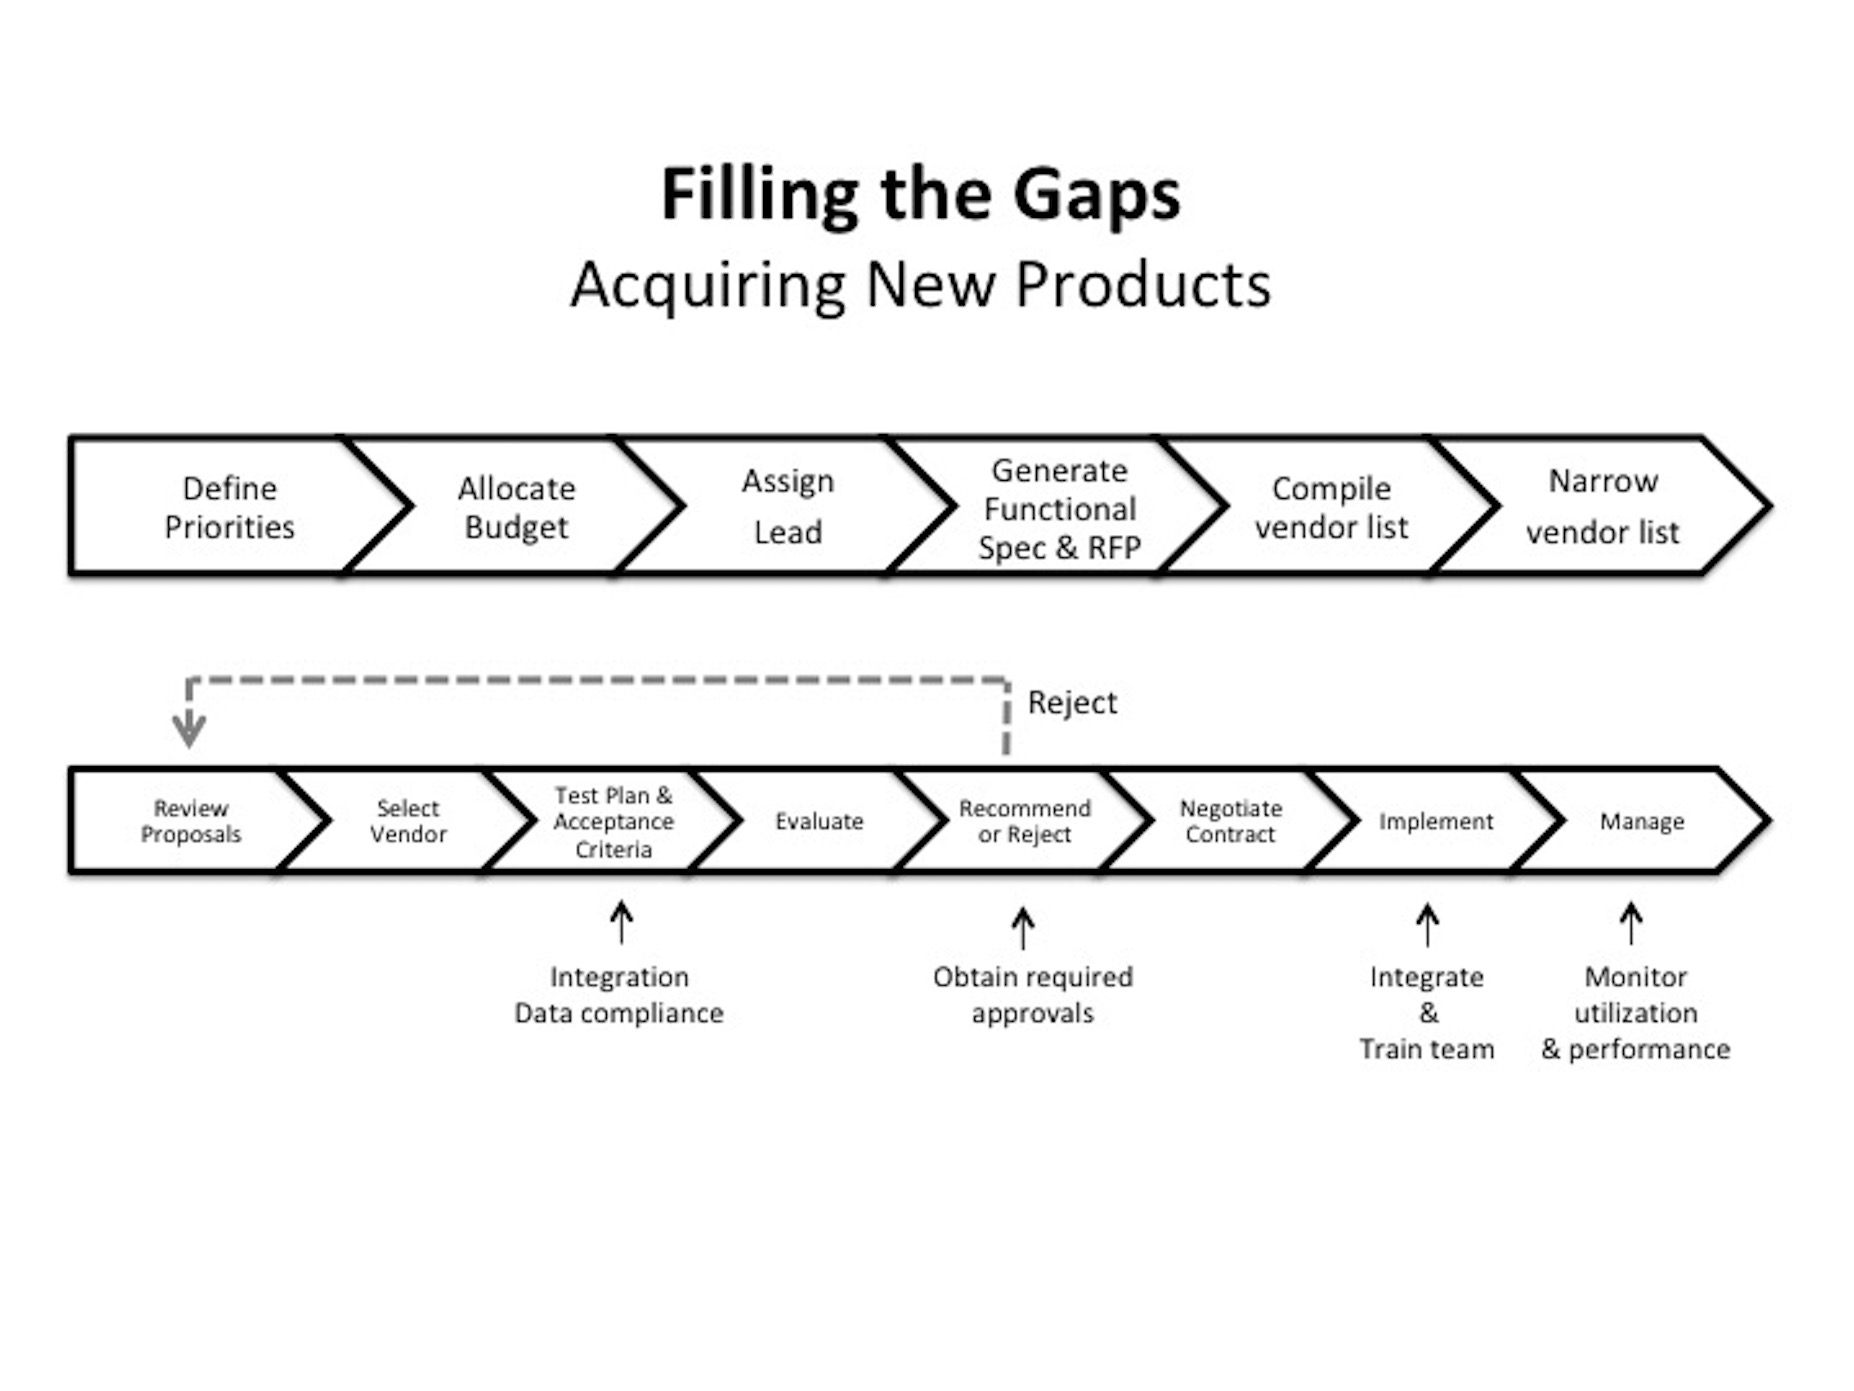 Filling the Gaps